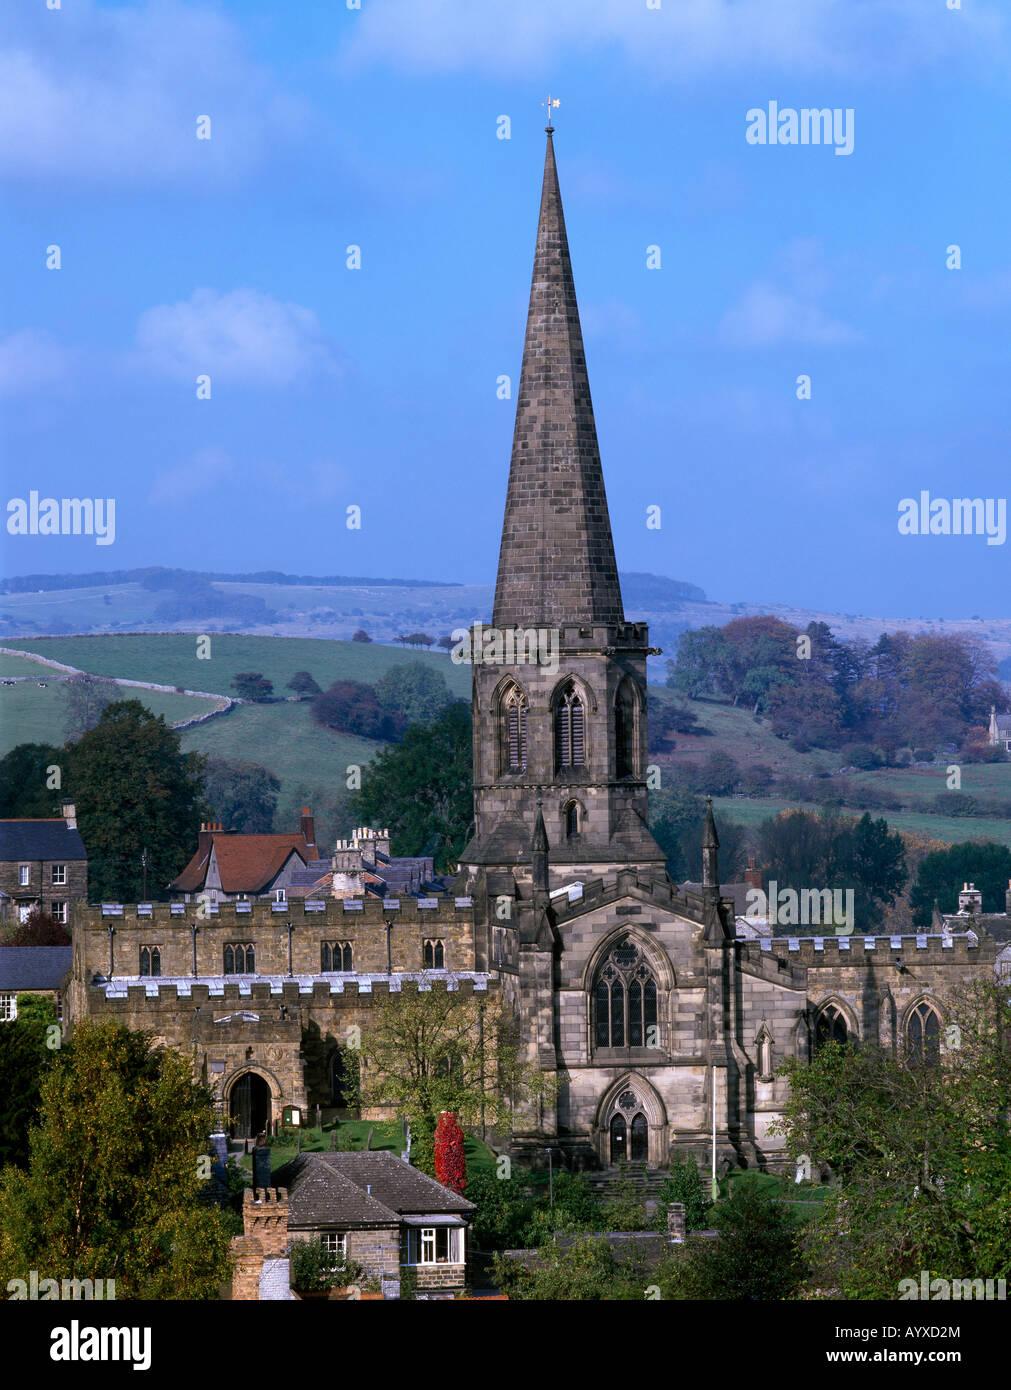 All Saints Church Bakewell Derbyshire England United Kingdom - Stock Image